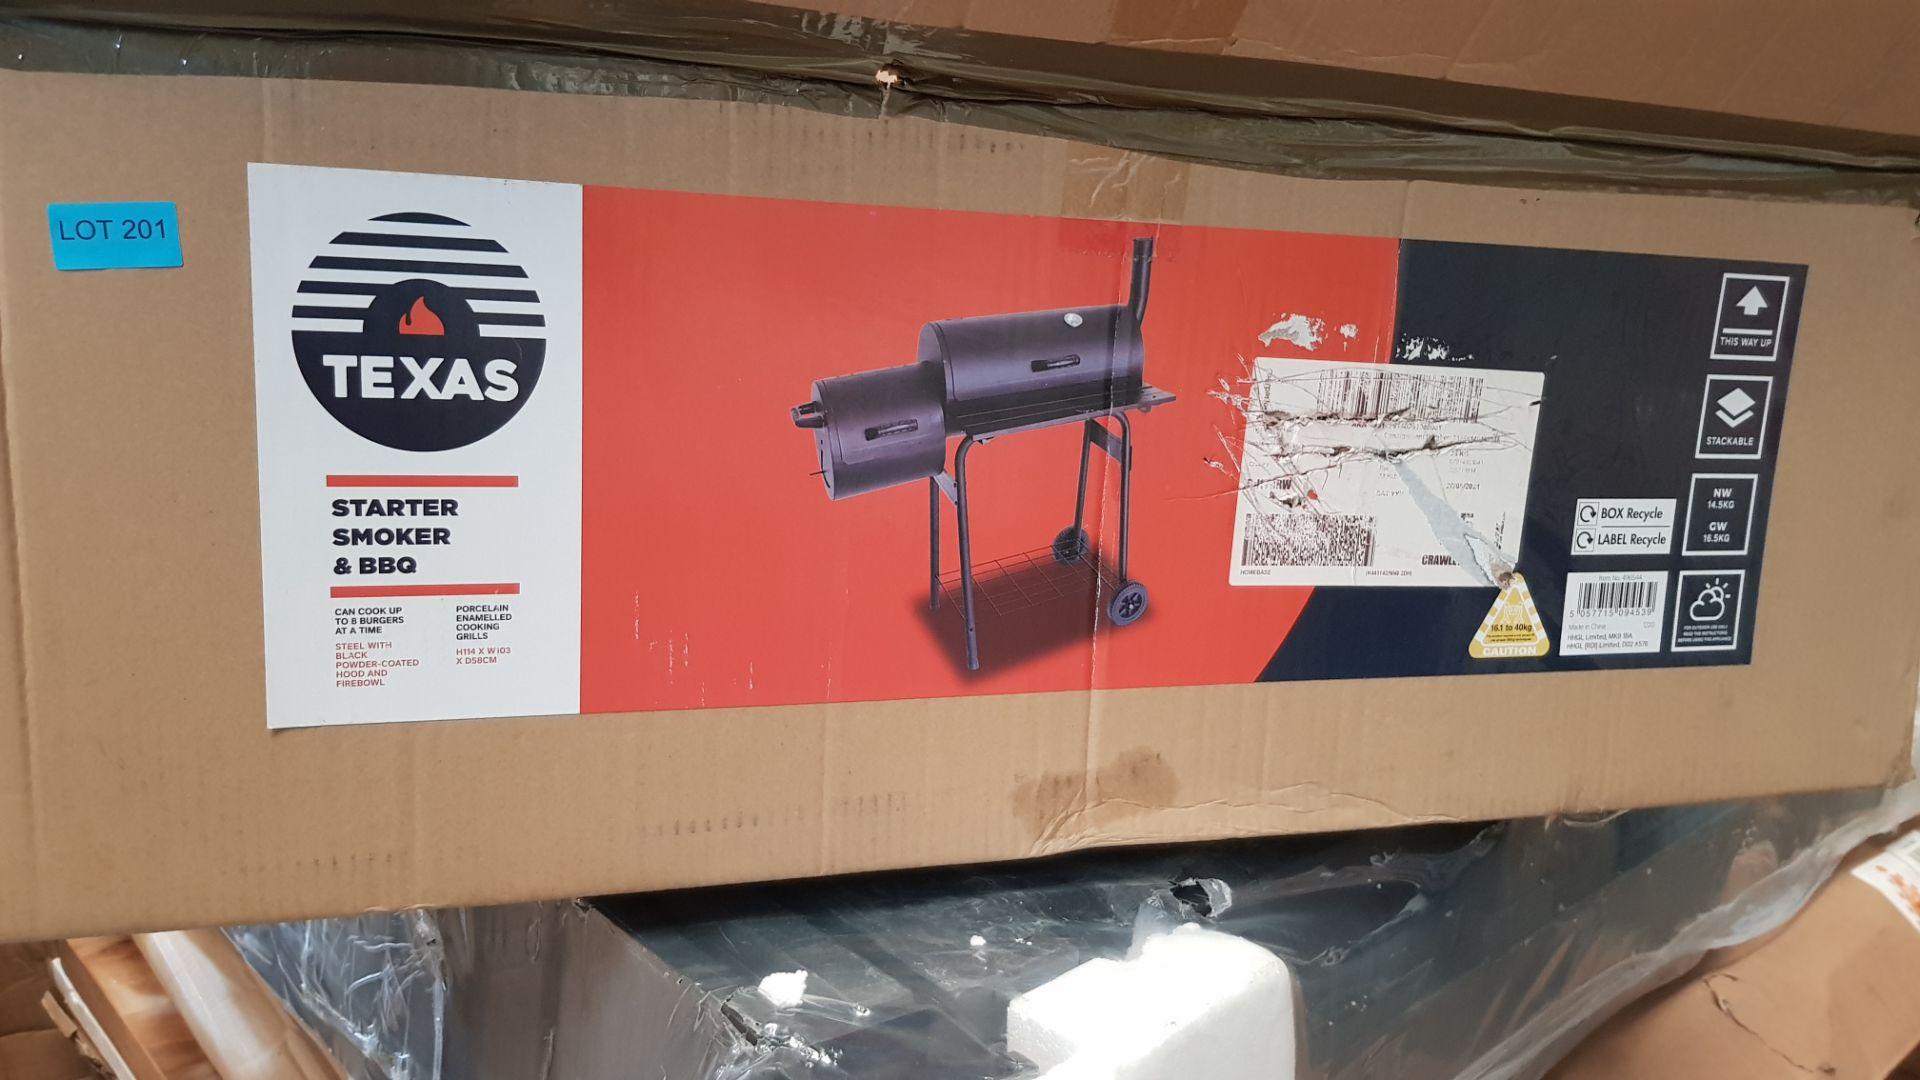 (P7) 1x Texas Starter Smoker & BBQ. Steel With Black Powder Coated Hood & Firebowl. (H114x W103x - Image 3 of 4